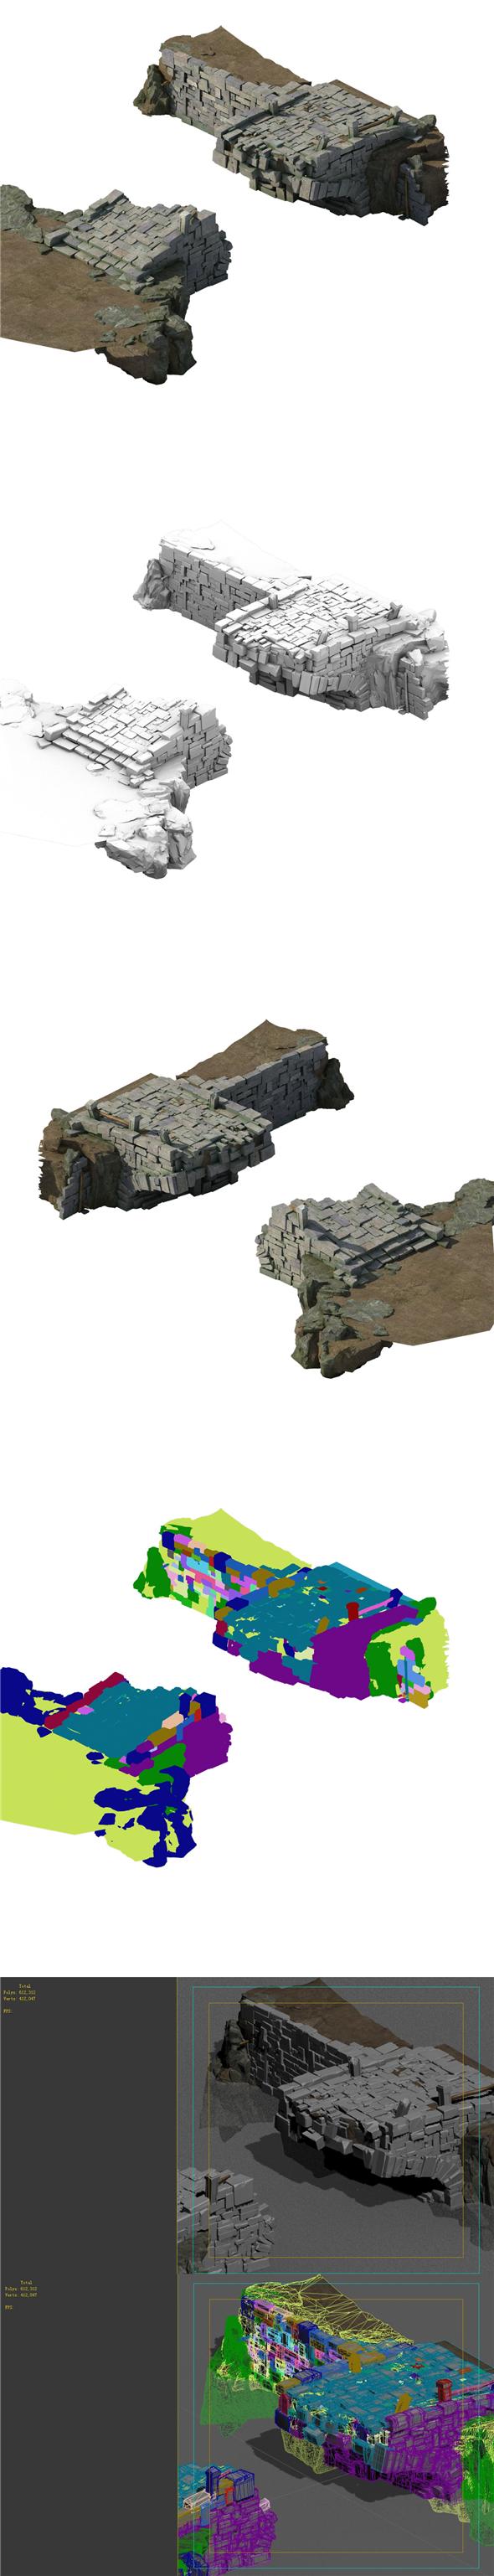 Village - broken stone bridge - 3DOcean Item for Sale